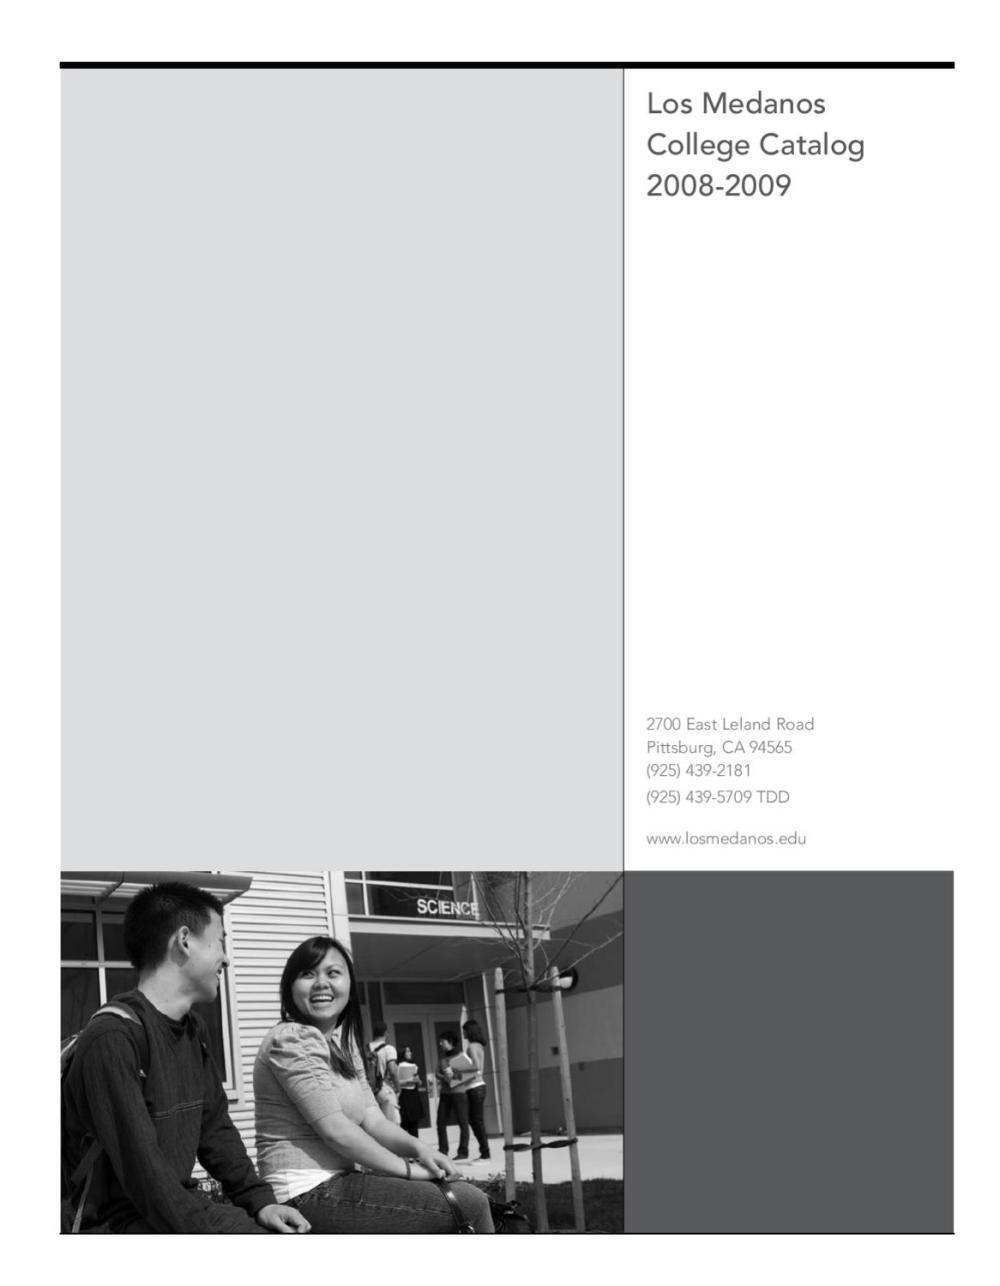 medium resolution of Los Medanos College Catalog 2008-2009 by Los Medanos College - issuu